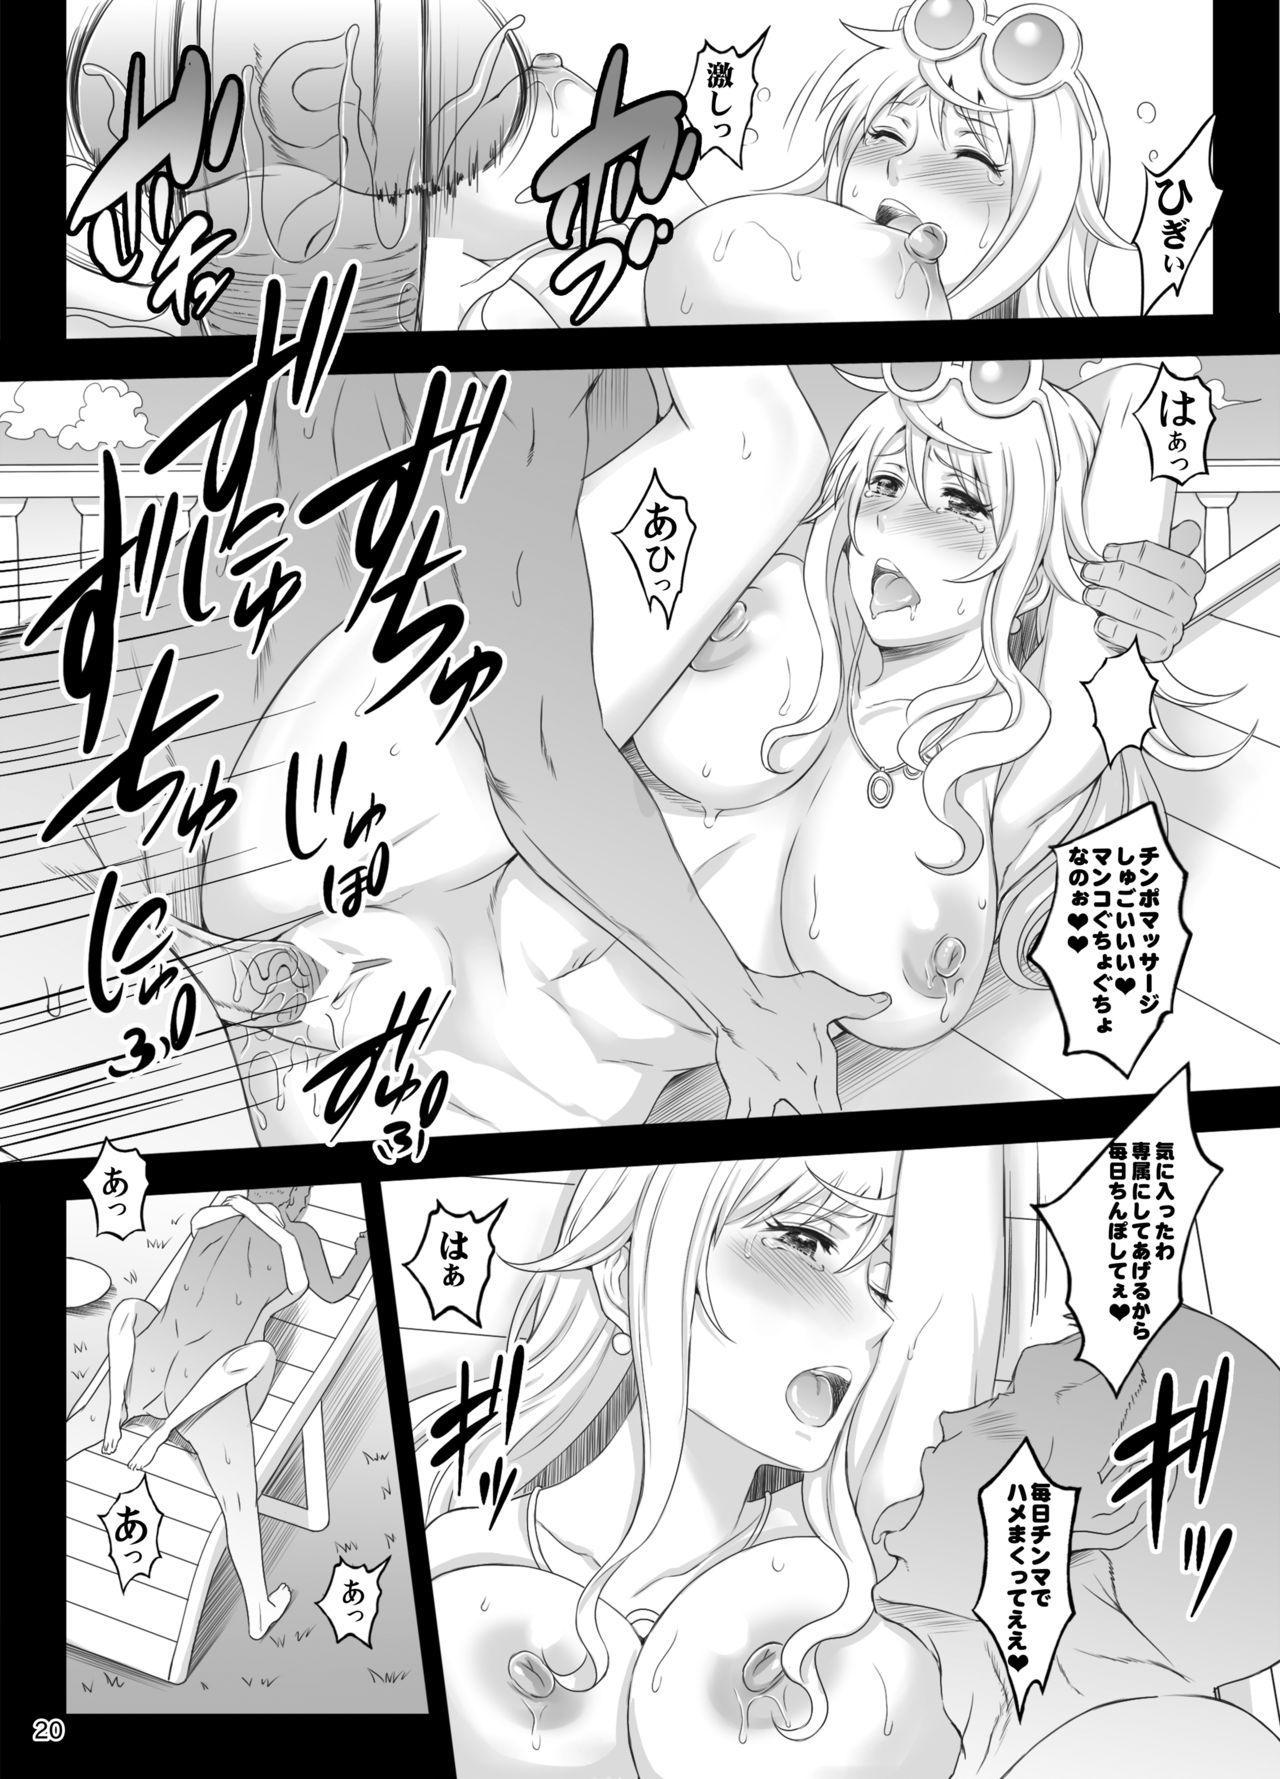 Rakuen Onna Kaizoku 4 - Woman Pirate in Paradise 17